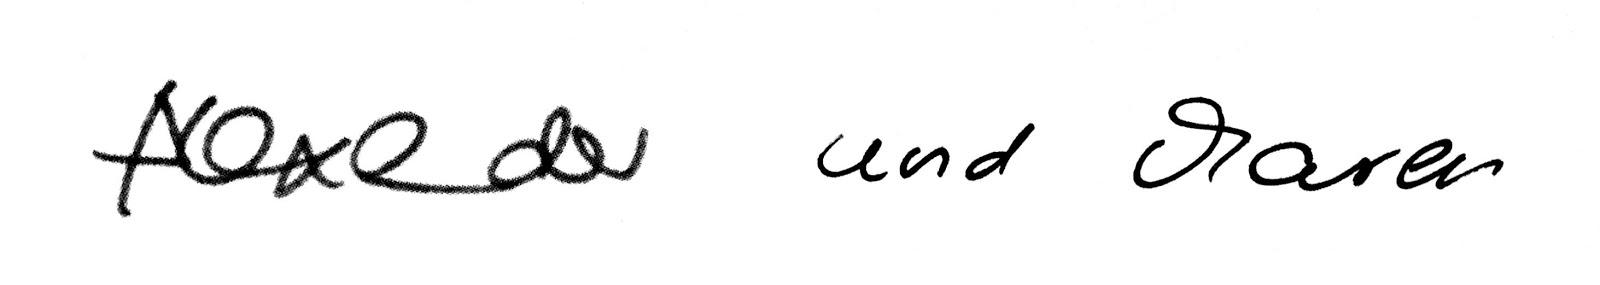 Unterschrift Alexander Maren